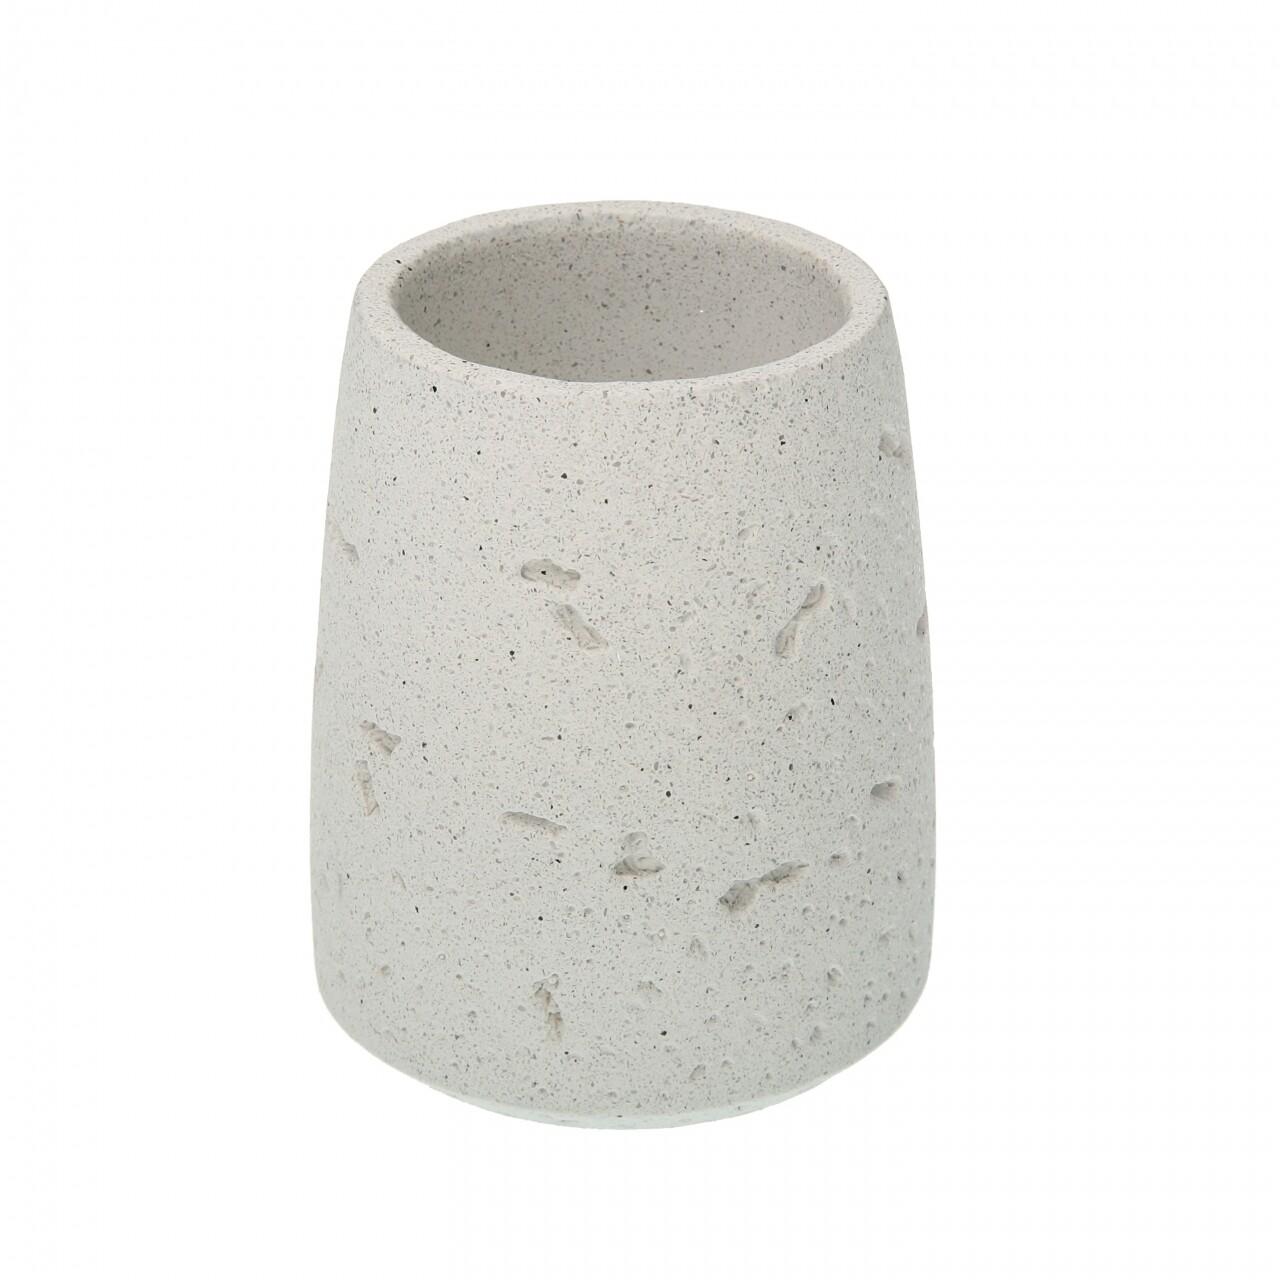 Suport periute de dinti Grand Sand, Versa,8.5 x 8.5 x 16 cm, polirasina, bej